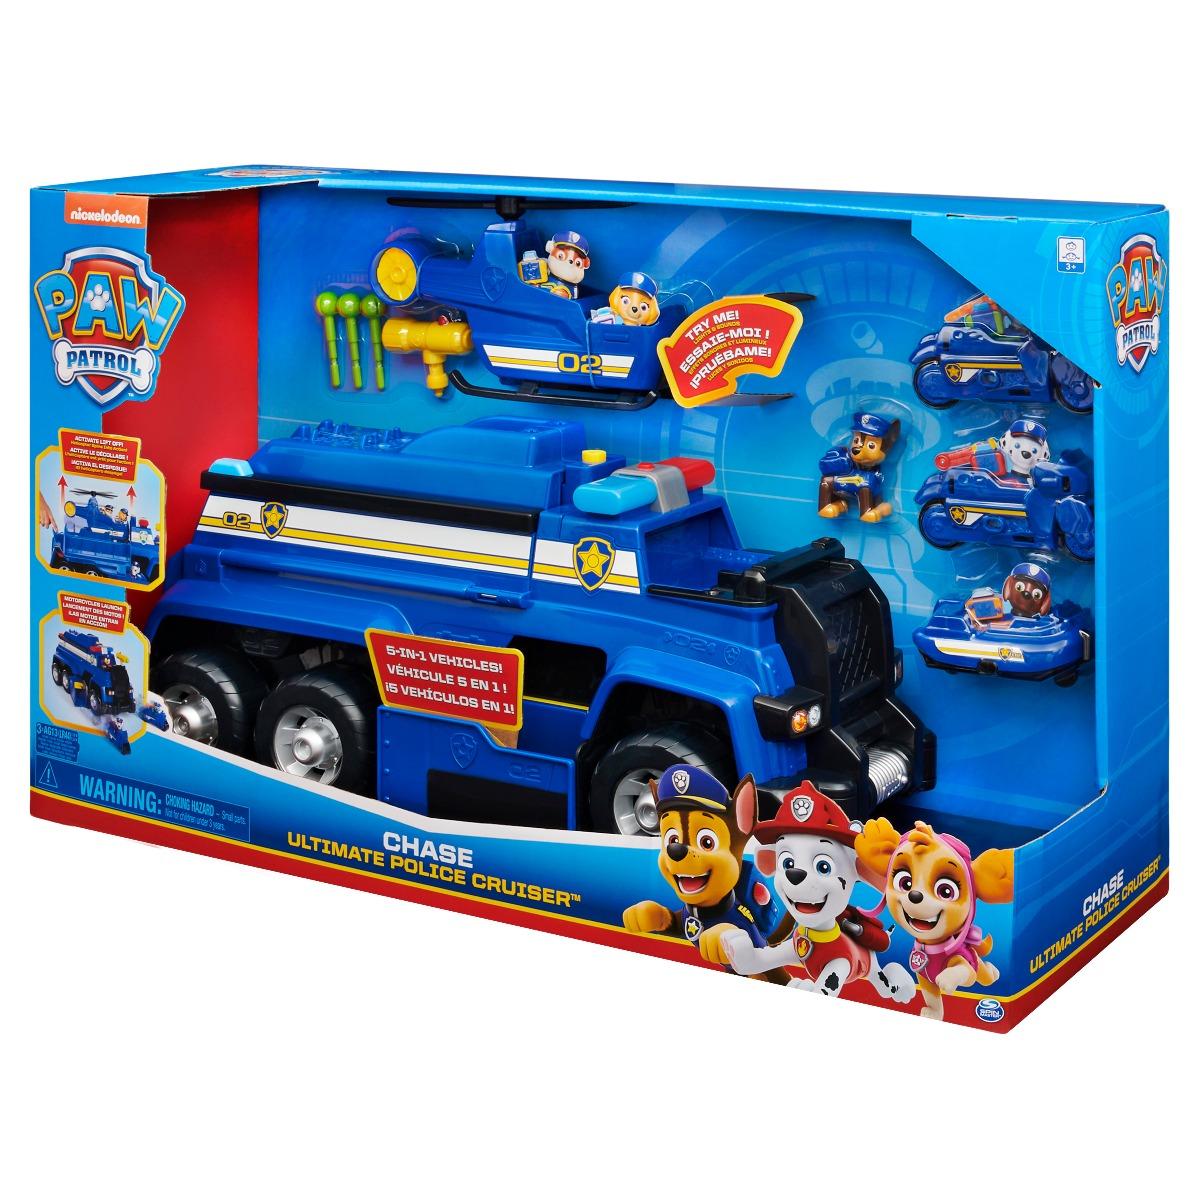 Set de joaca cu figurina si vehicule Paw Patrol Chase Ultimate Police Cruiser